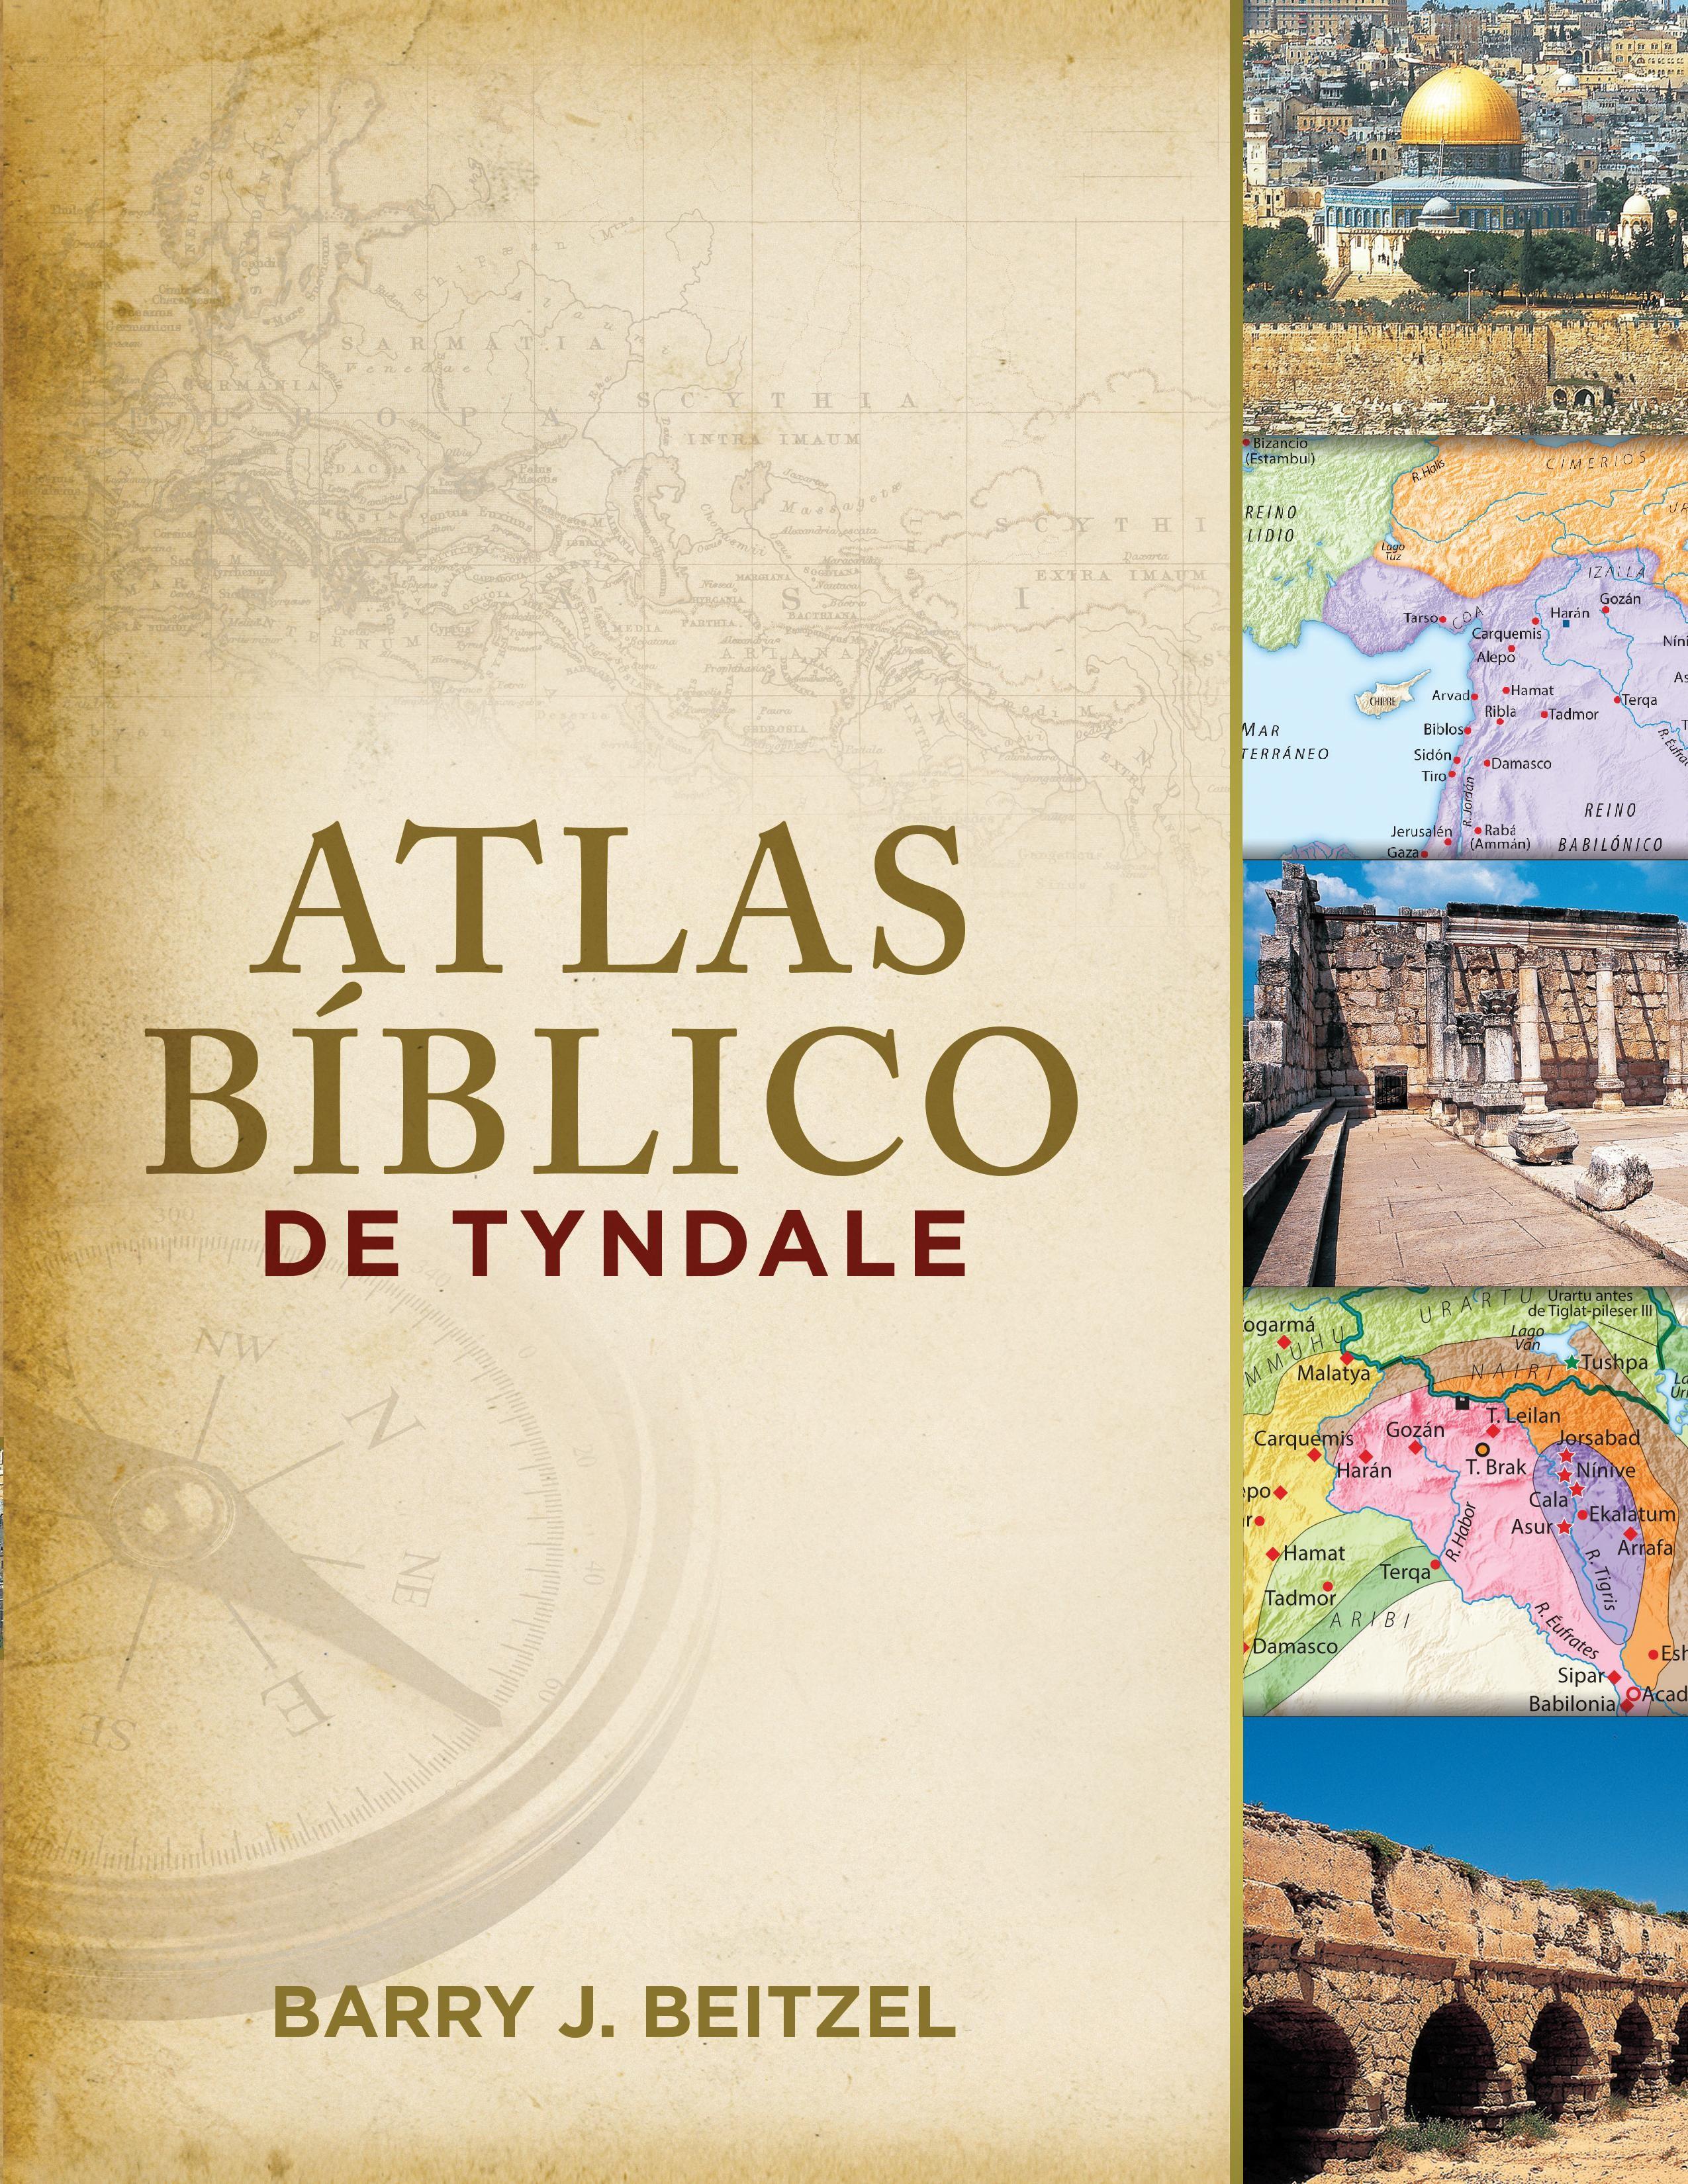 Atlas bíblico de Tyndale: Tyndale Bible Atlas